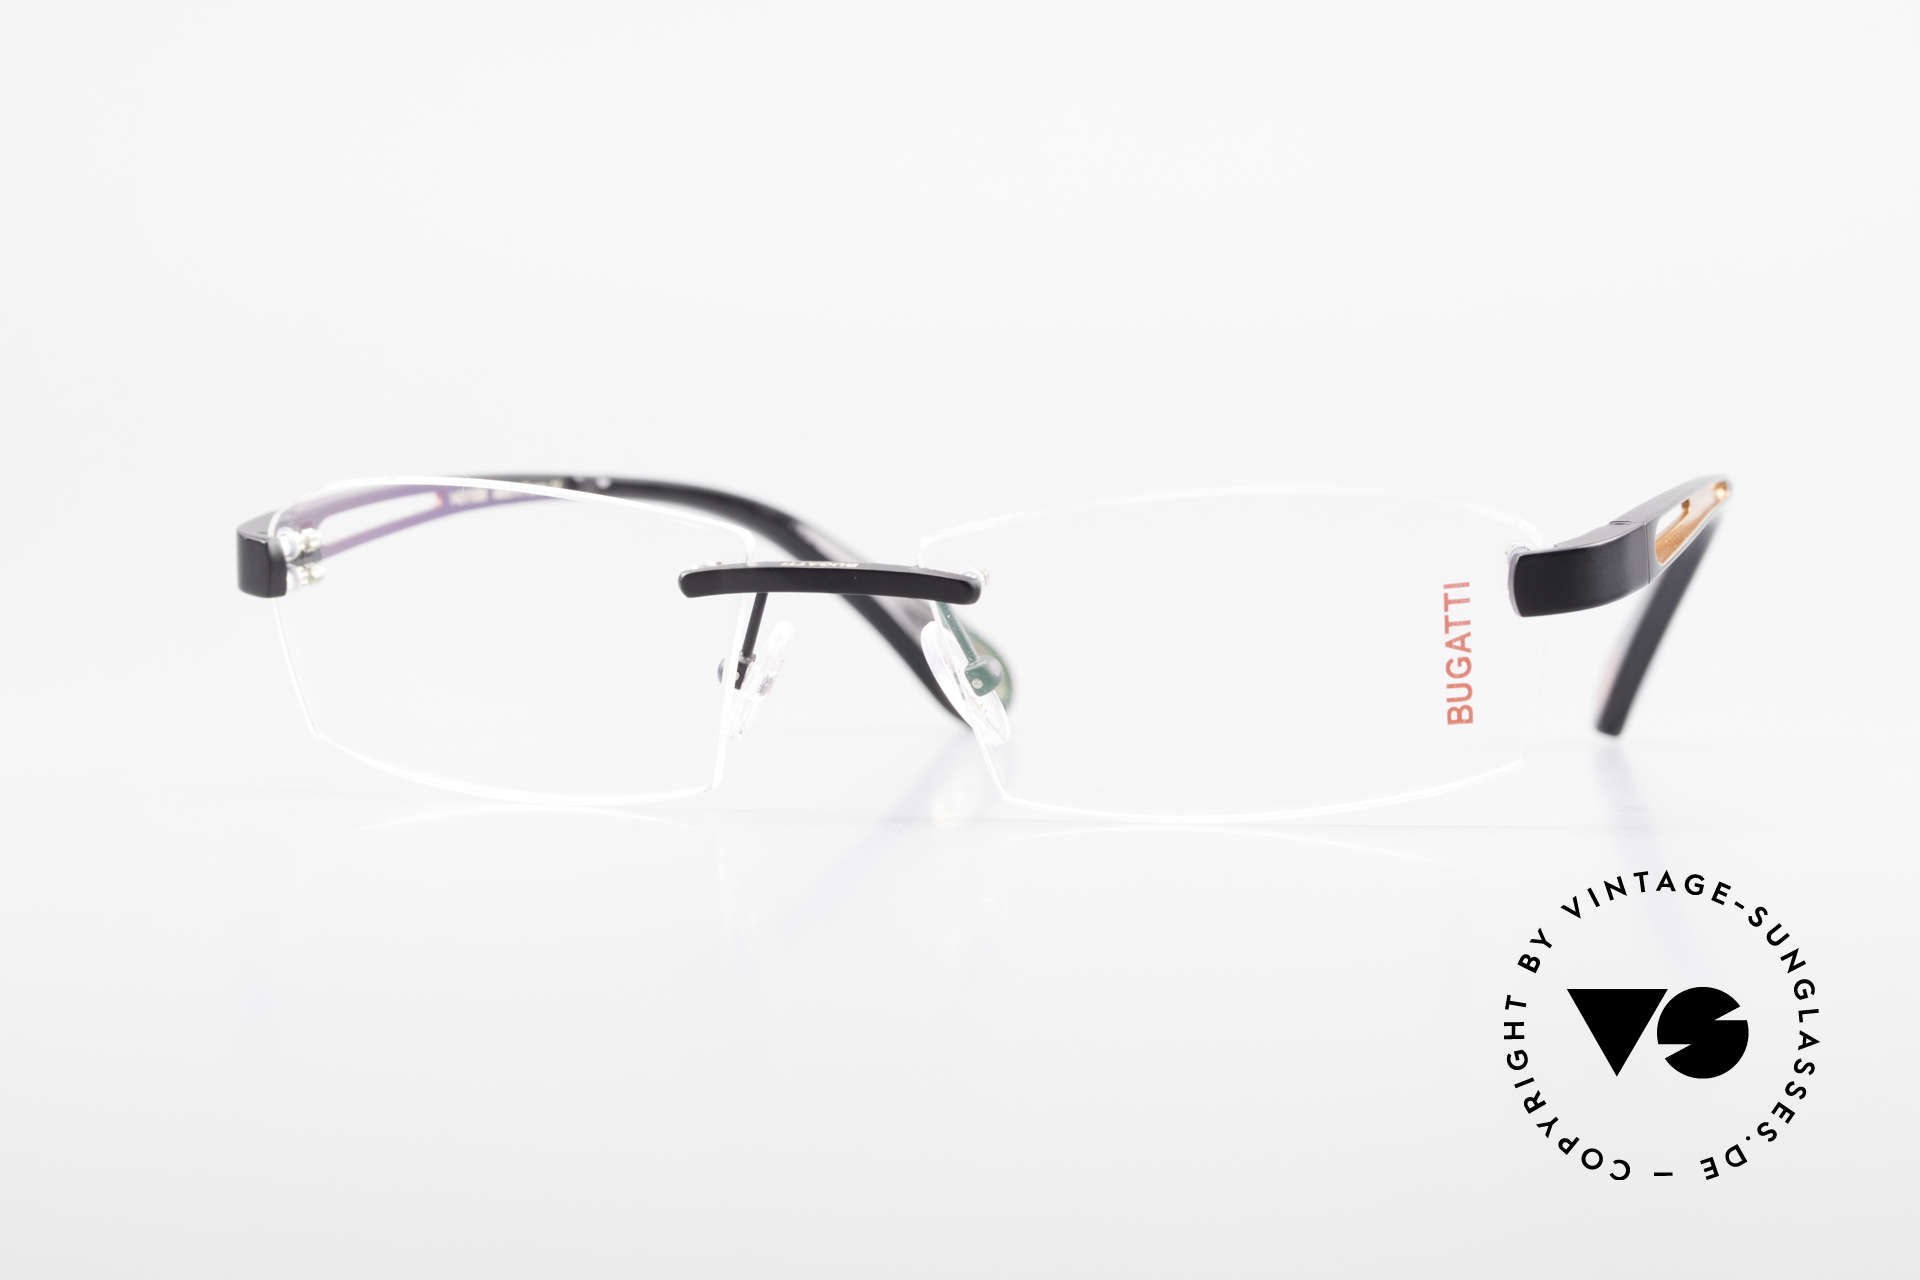 Bugatti 515 Rimless Designer Glasses Men, original, vintage rimless eyeglass-frame by Bugatti, Made for Men